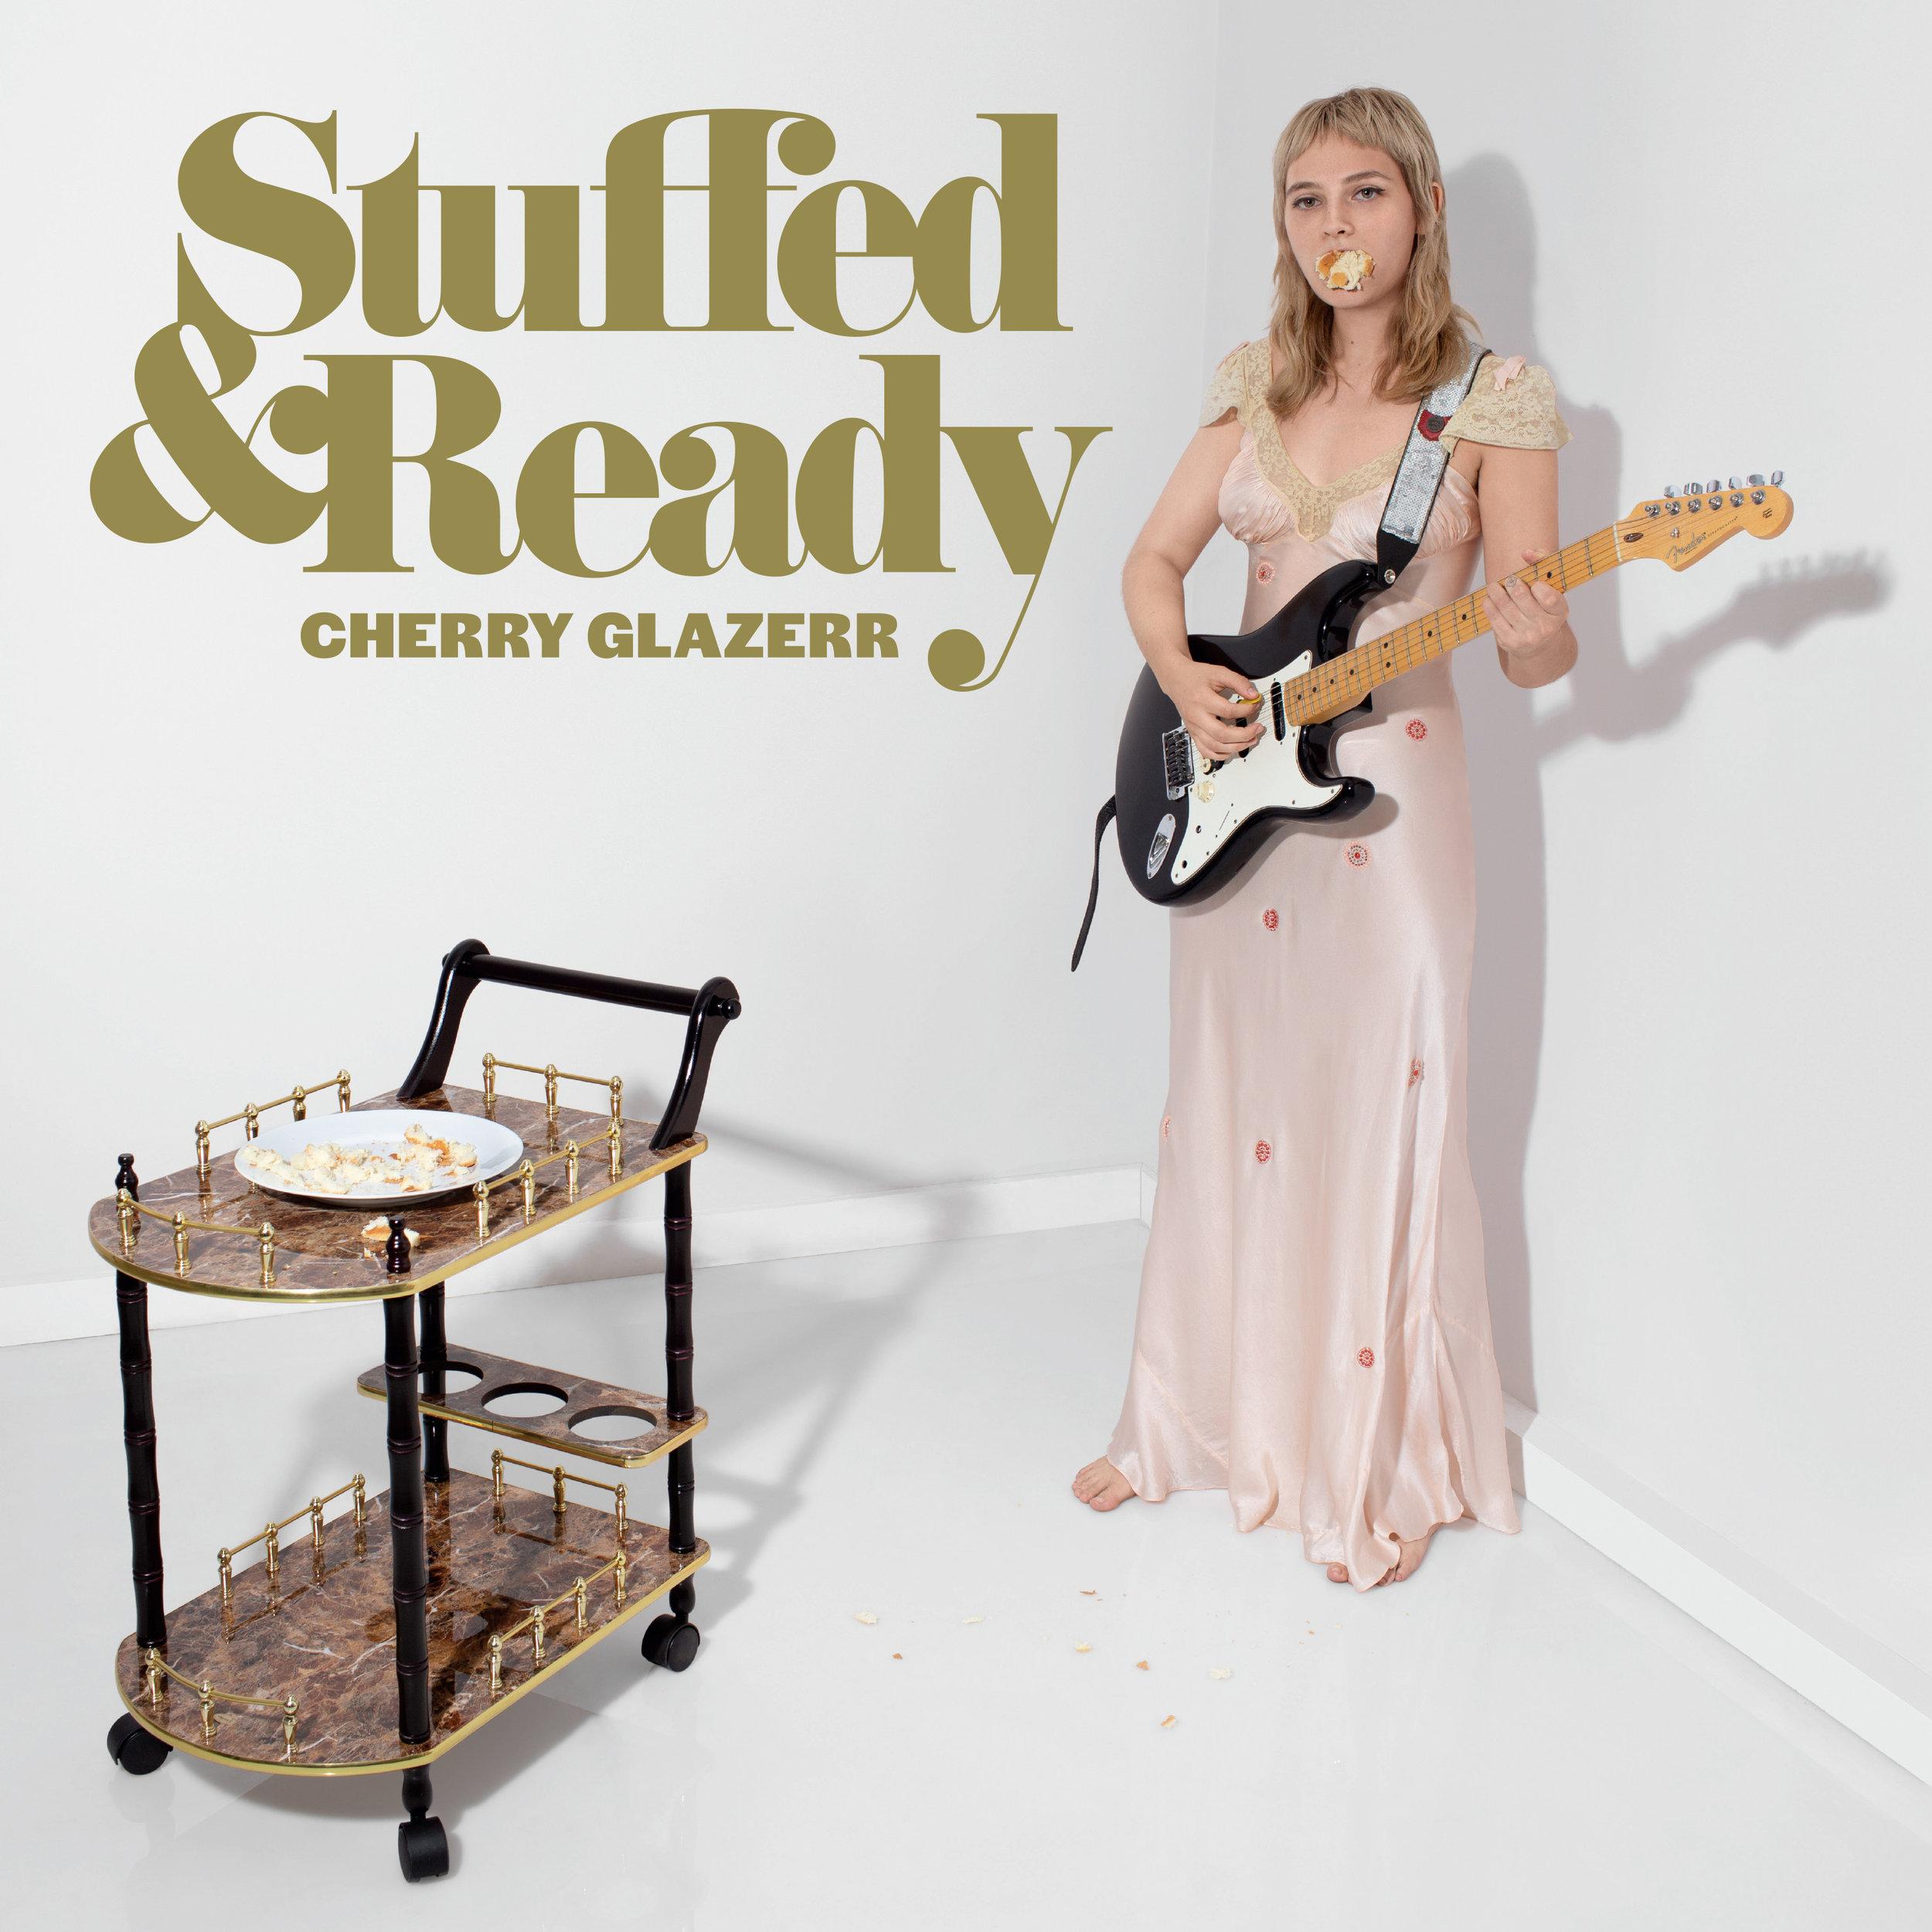 CherryGlazerr-StuffedReady.jpg